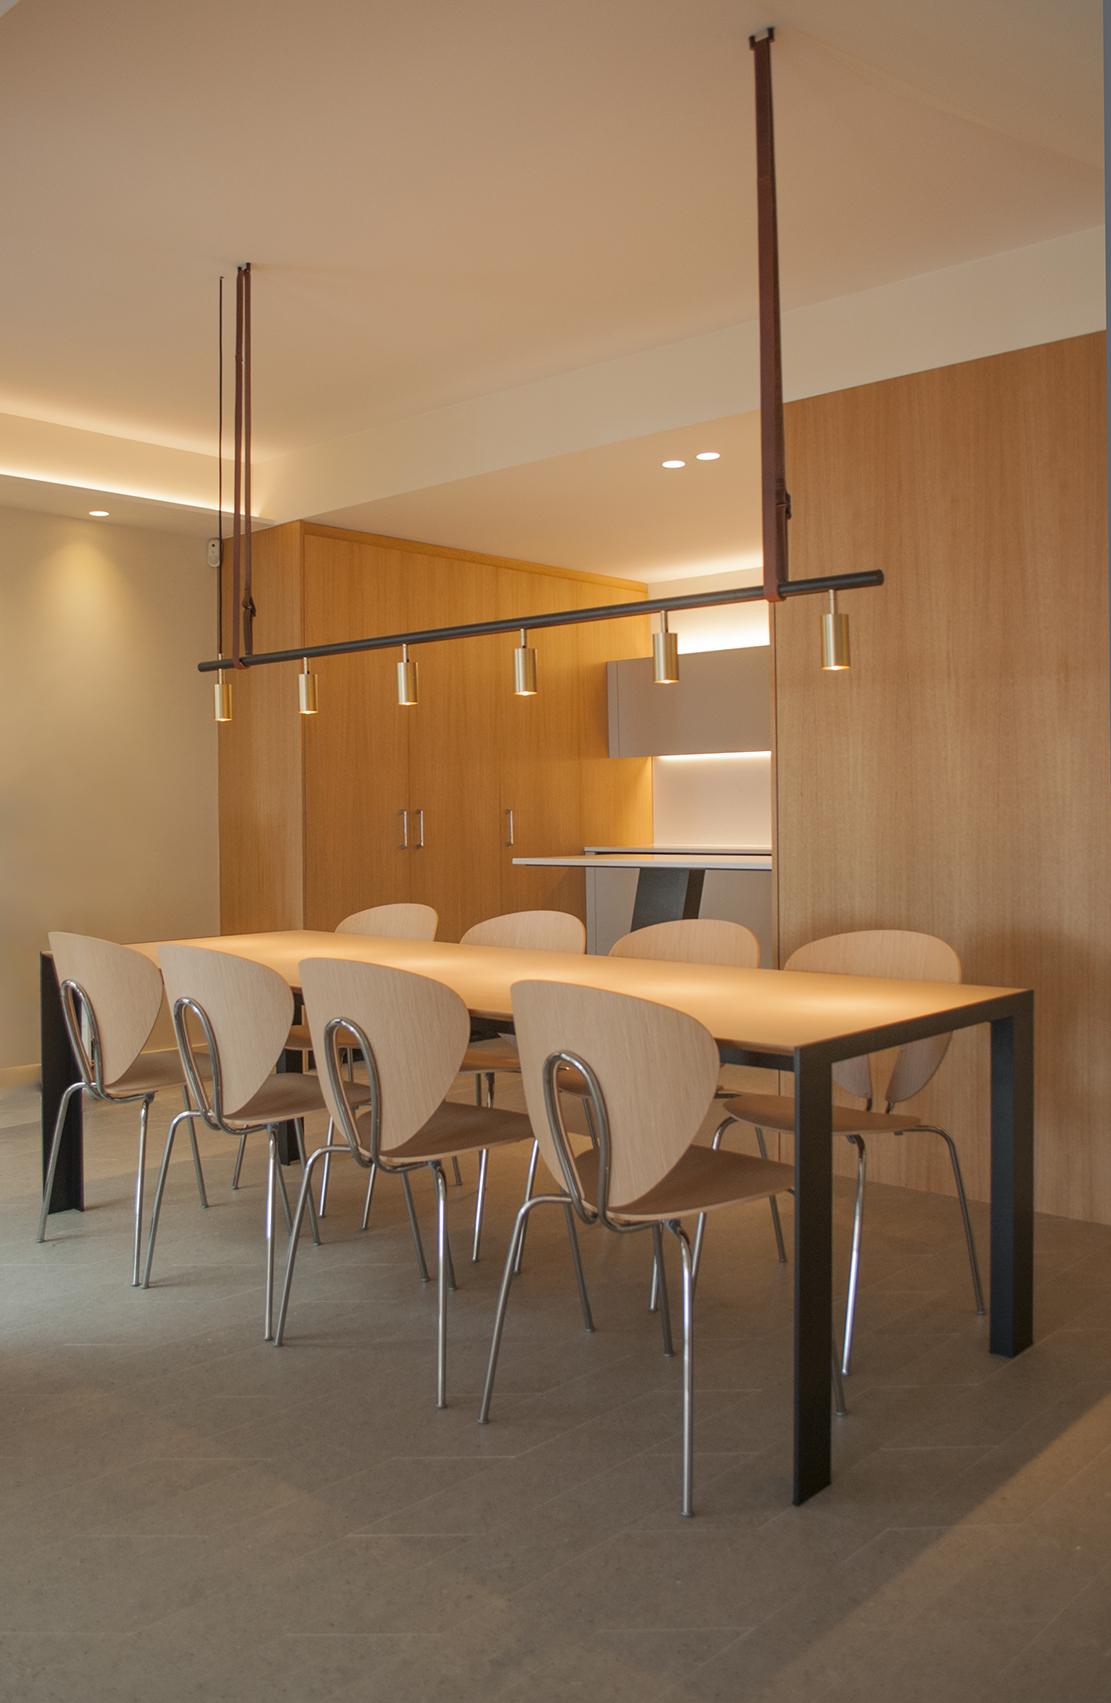 2-arquitectura-sitges-interiorismo-barcelona-comedor-moderno-lampara-globus-debeb-stua-madera-cocina-led